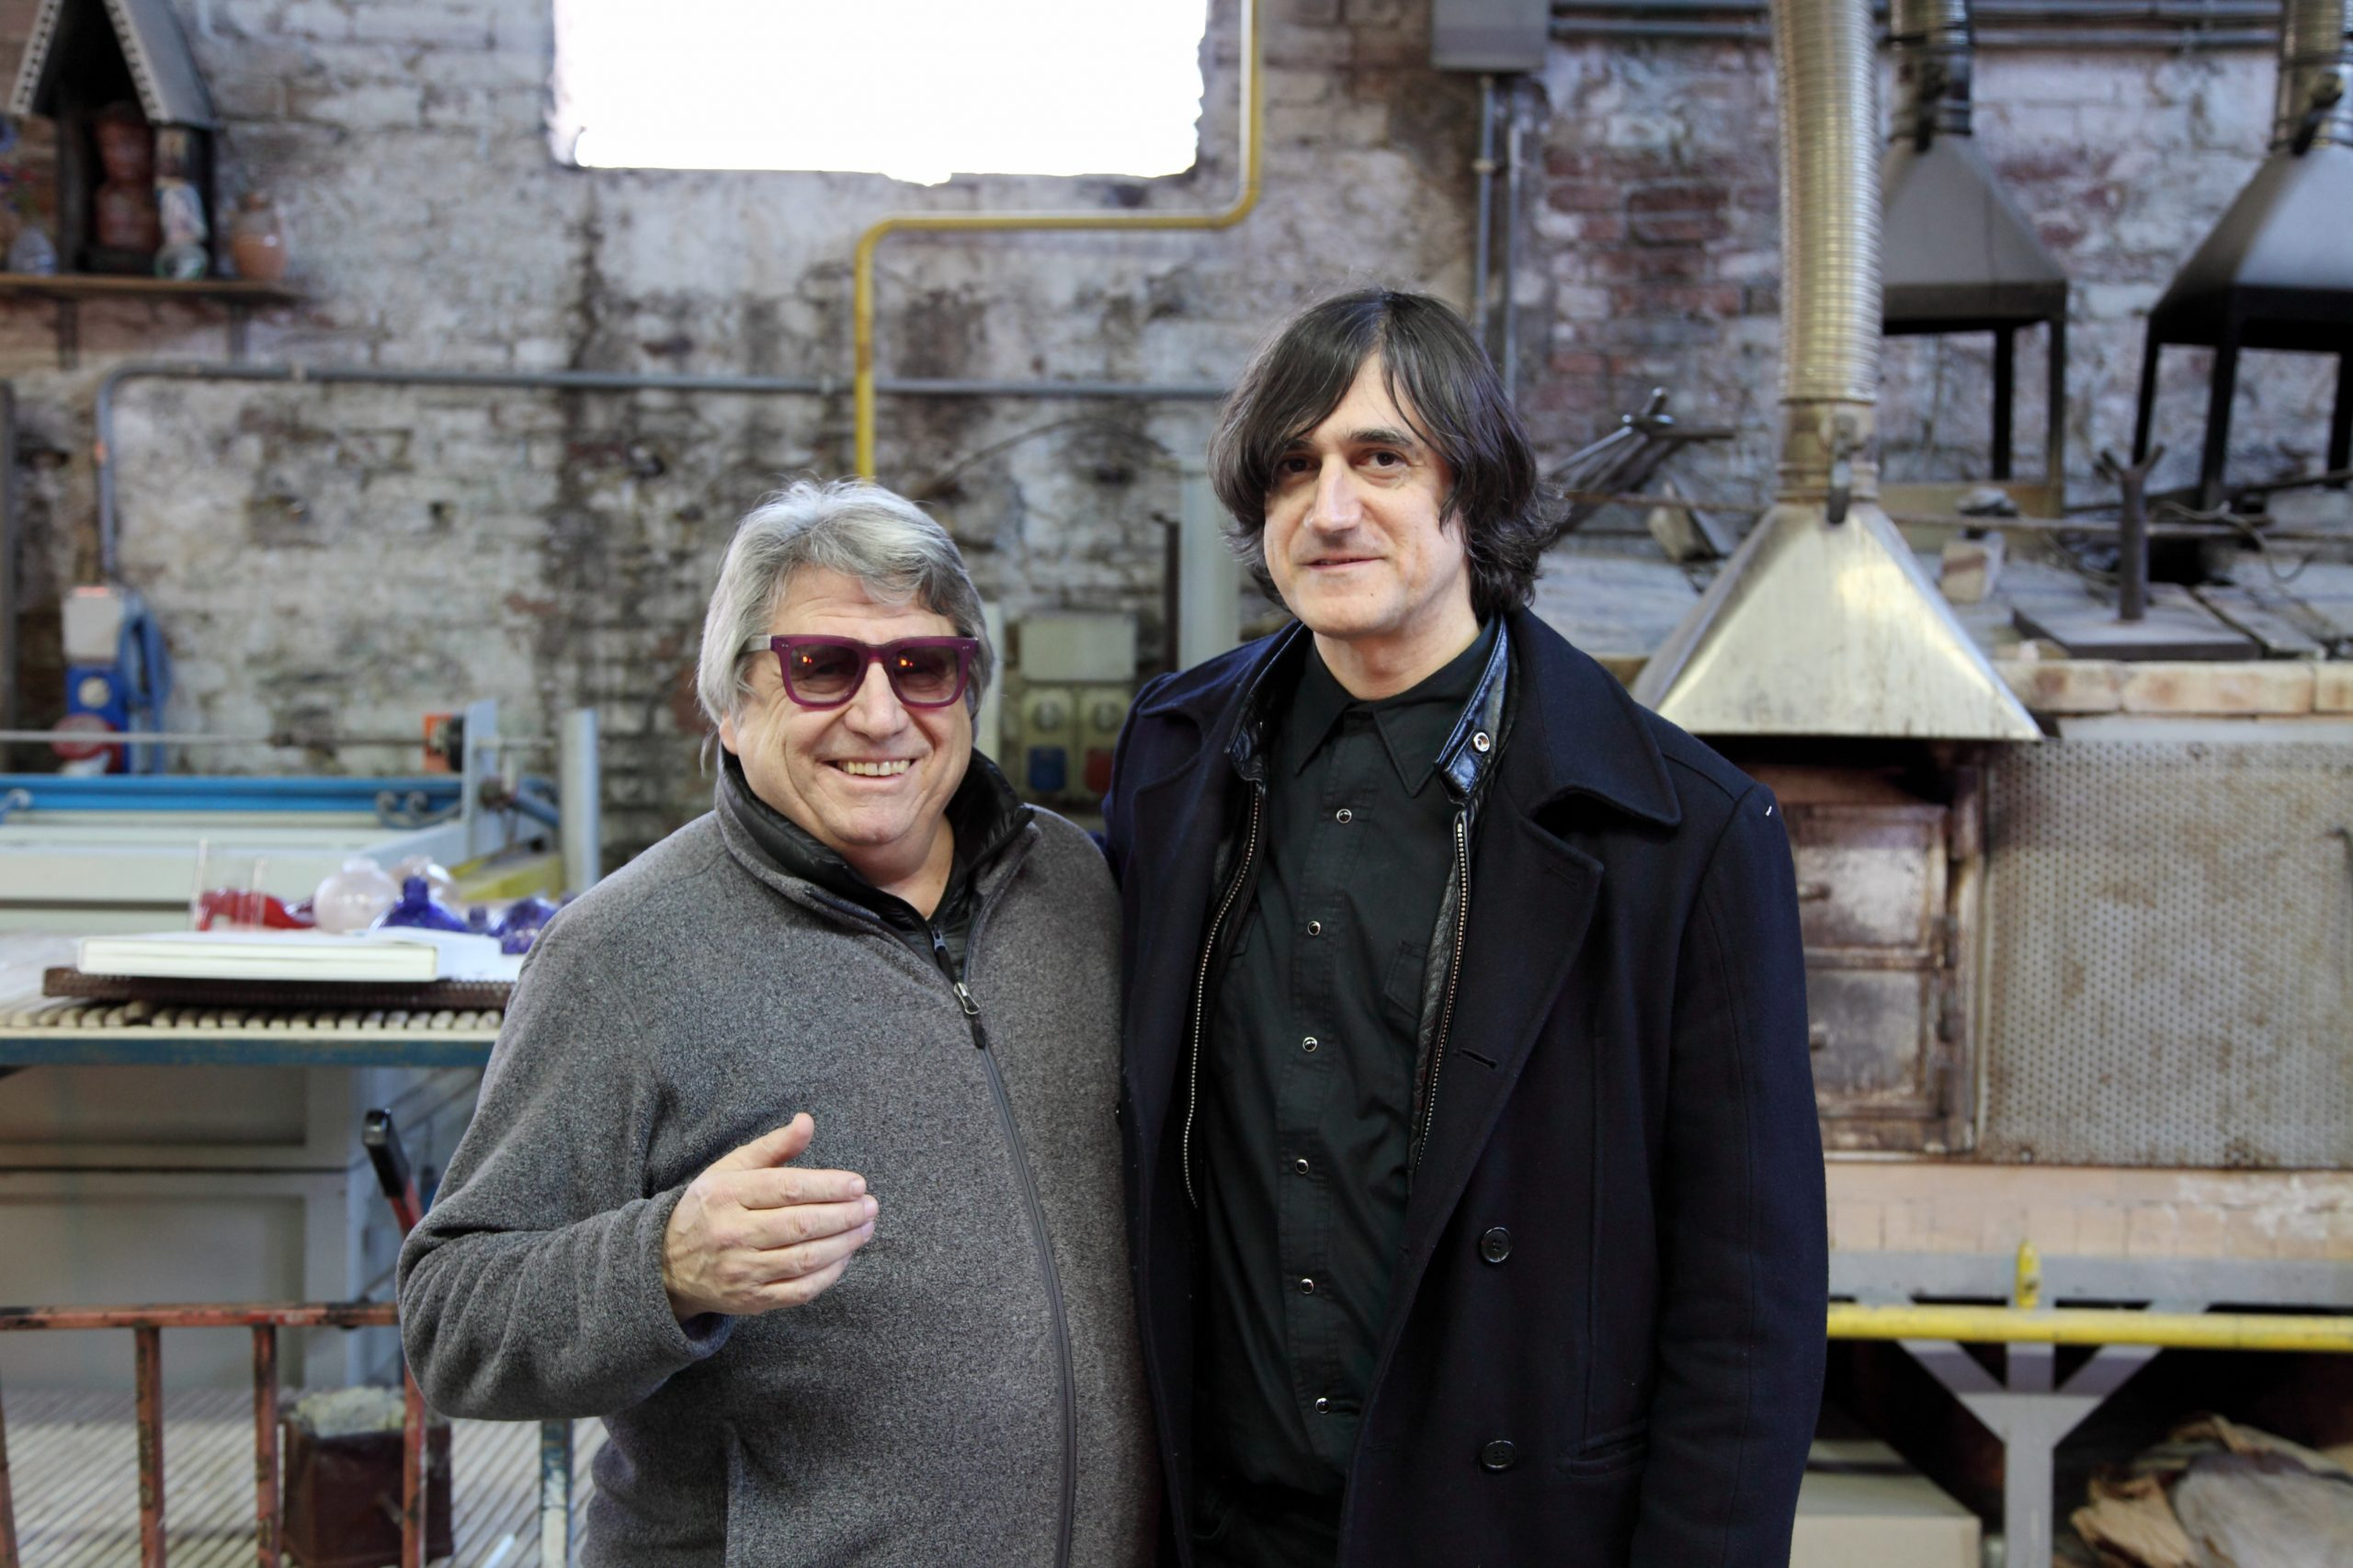 Adriano Berengo and Cameron Jamie in Berengo Studio 2017